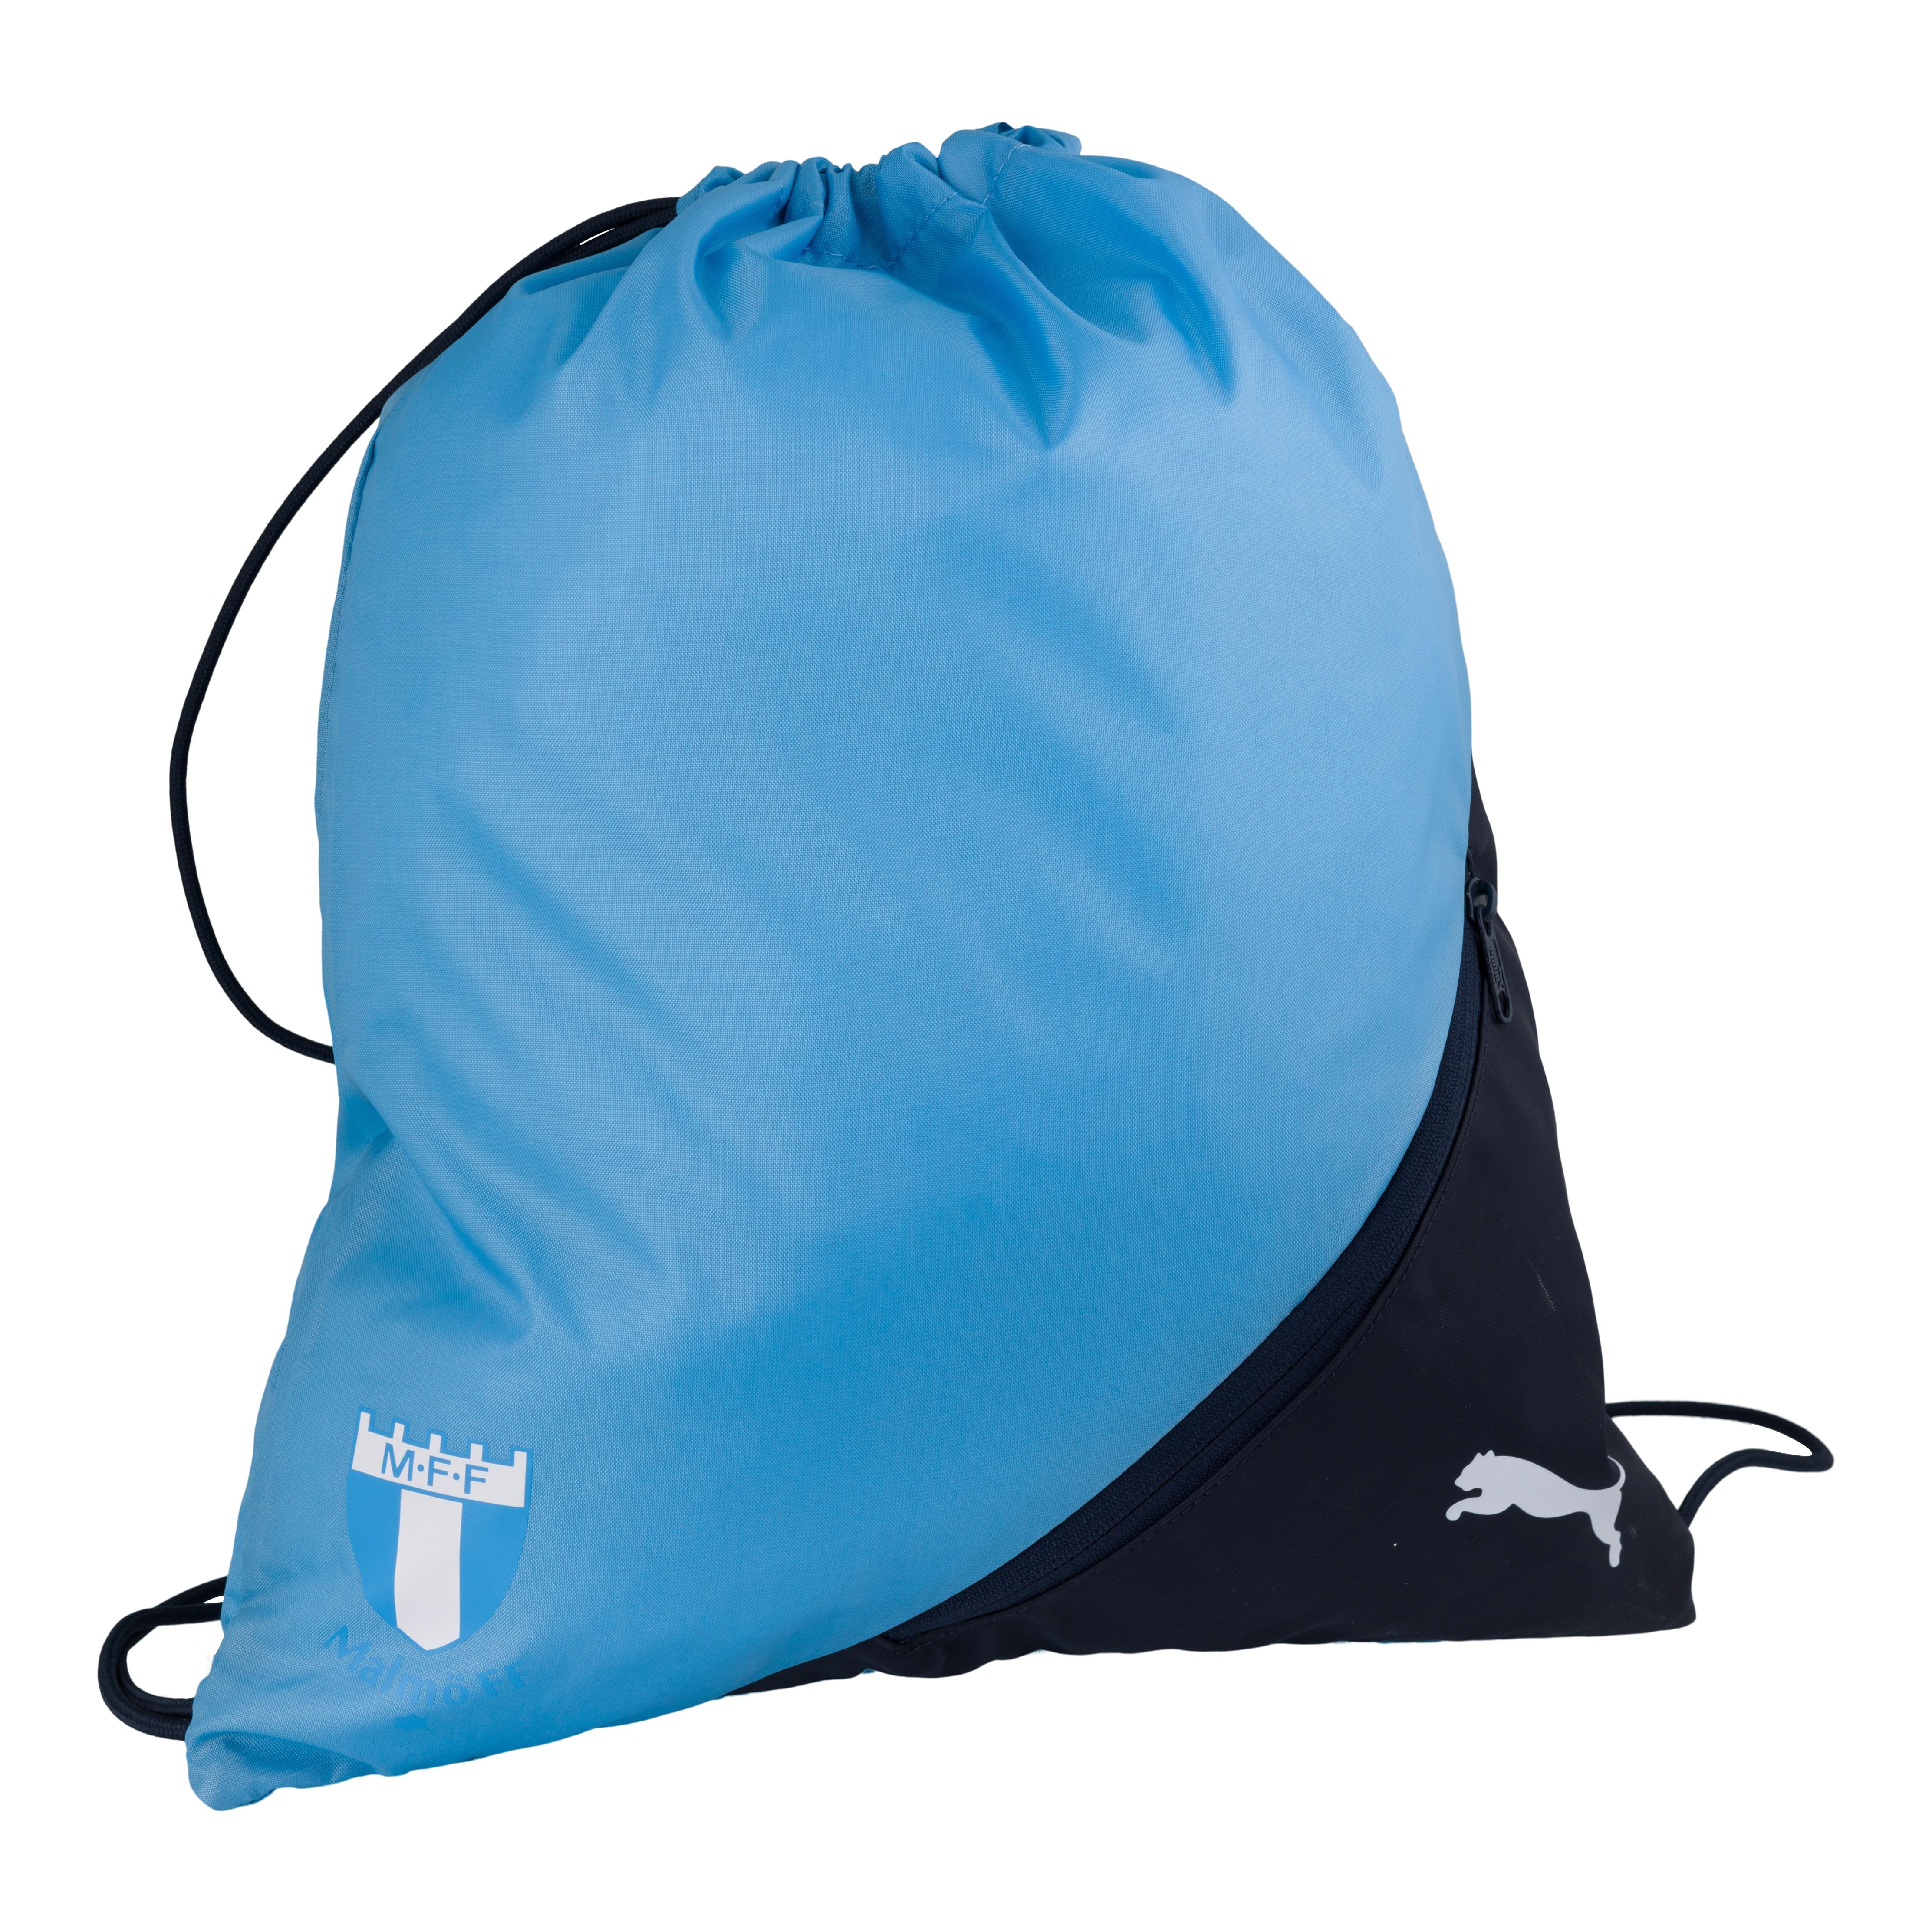 Puma gymbag ljusblå